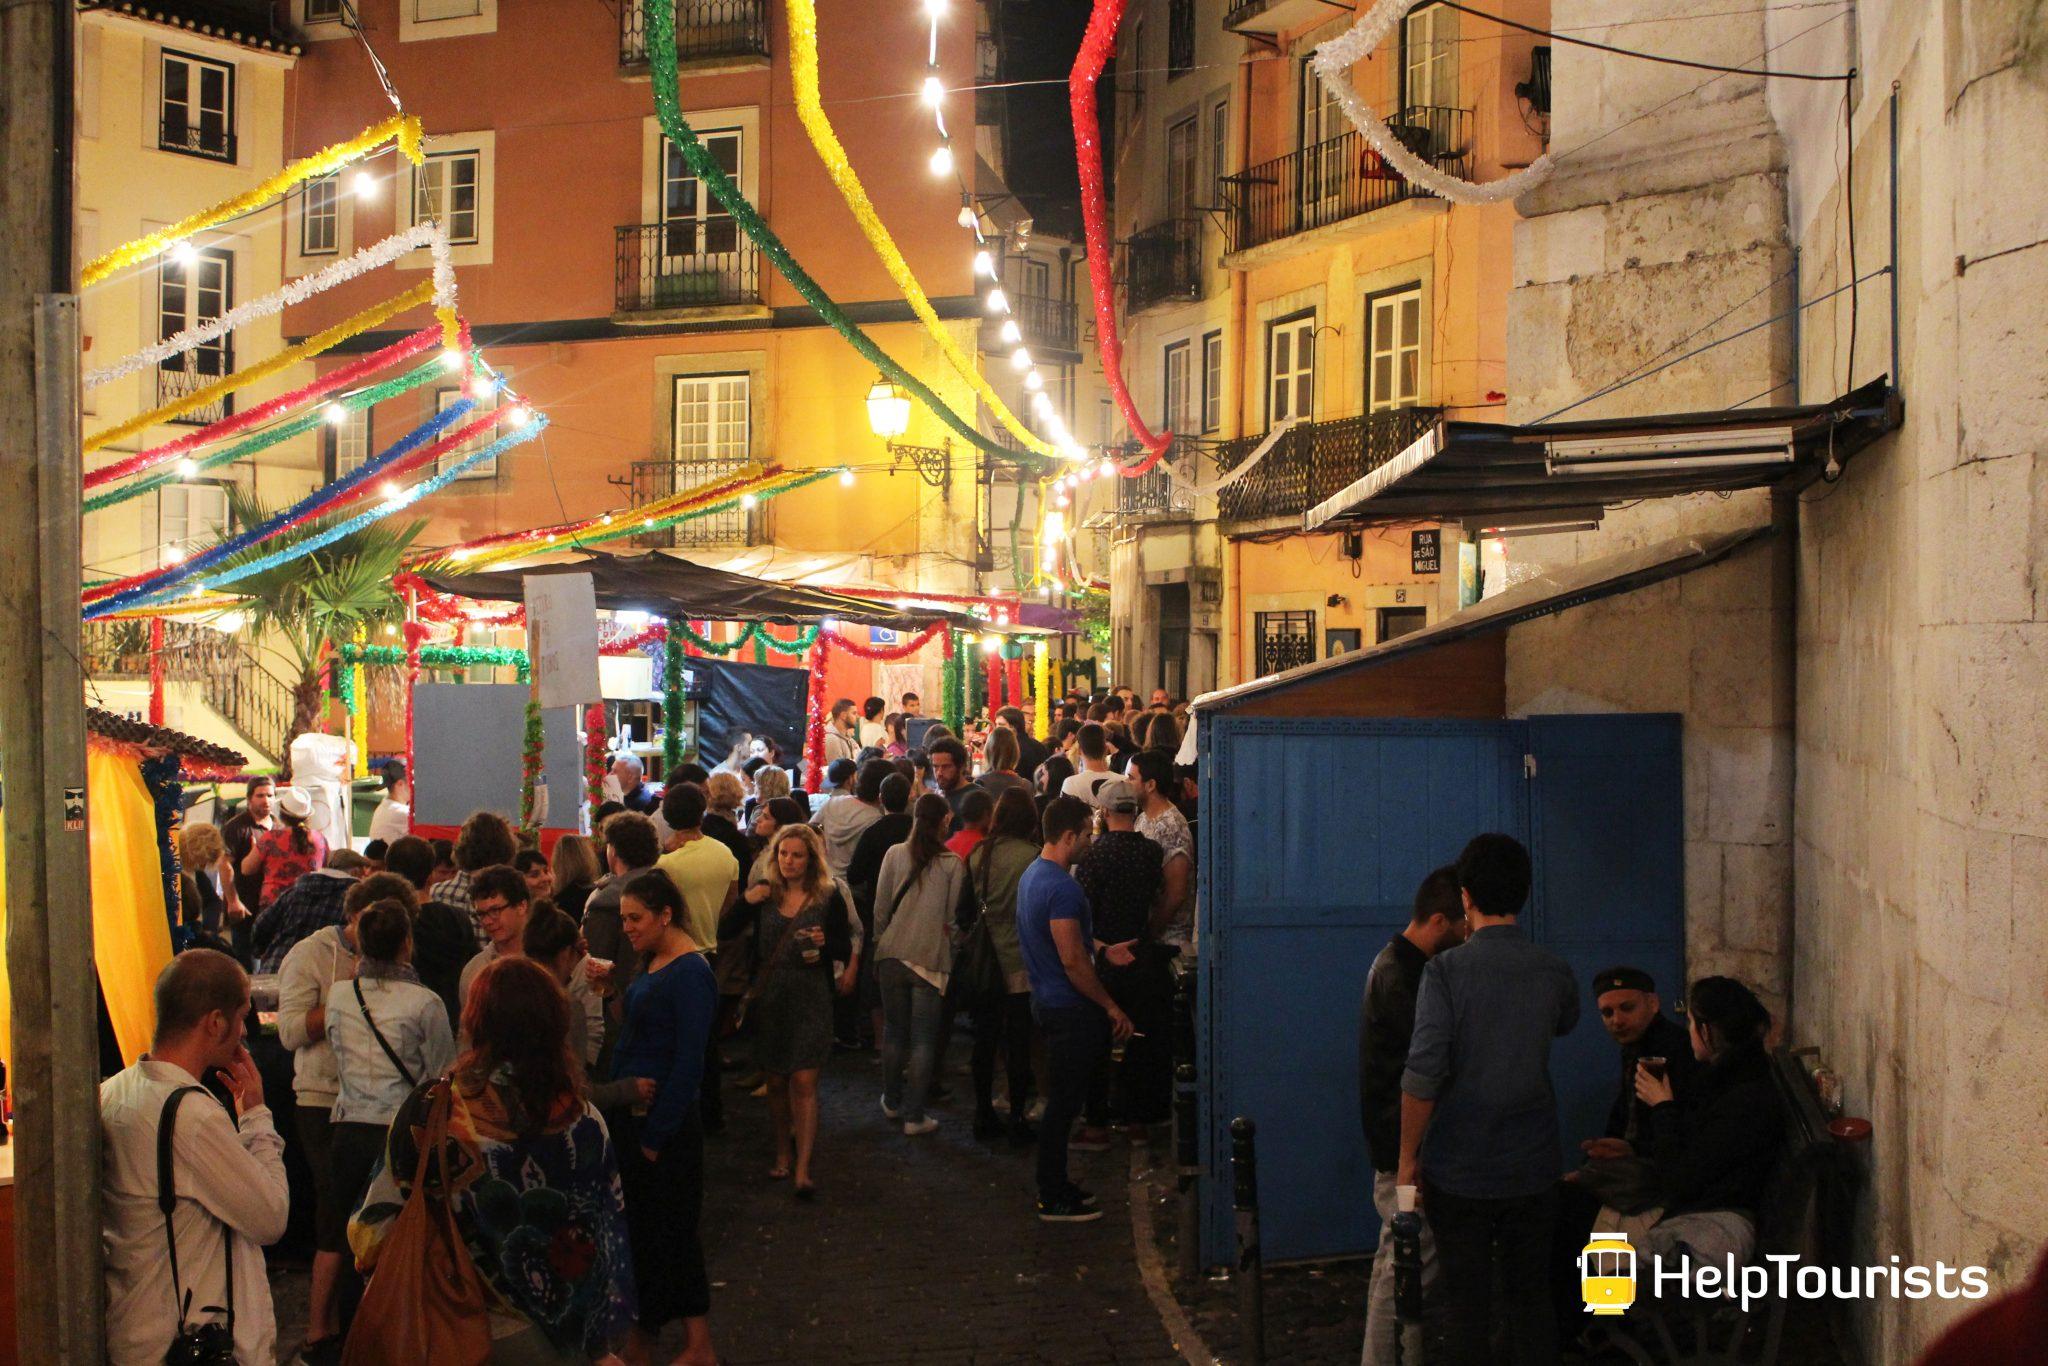 LISSABON_Alfama_Festas-Populares_02_l